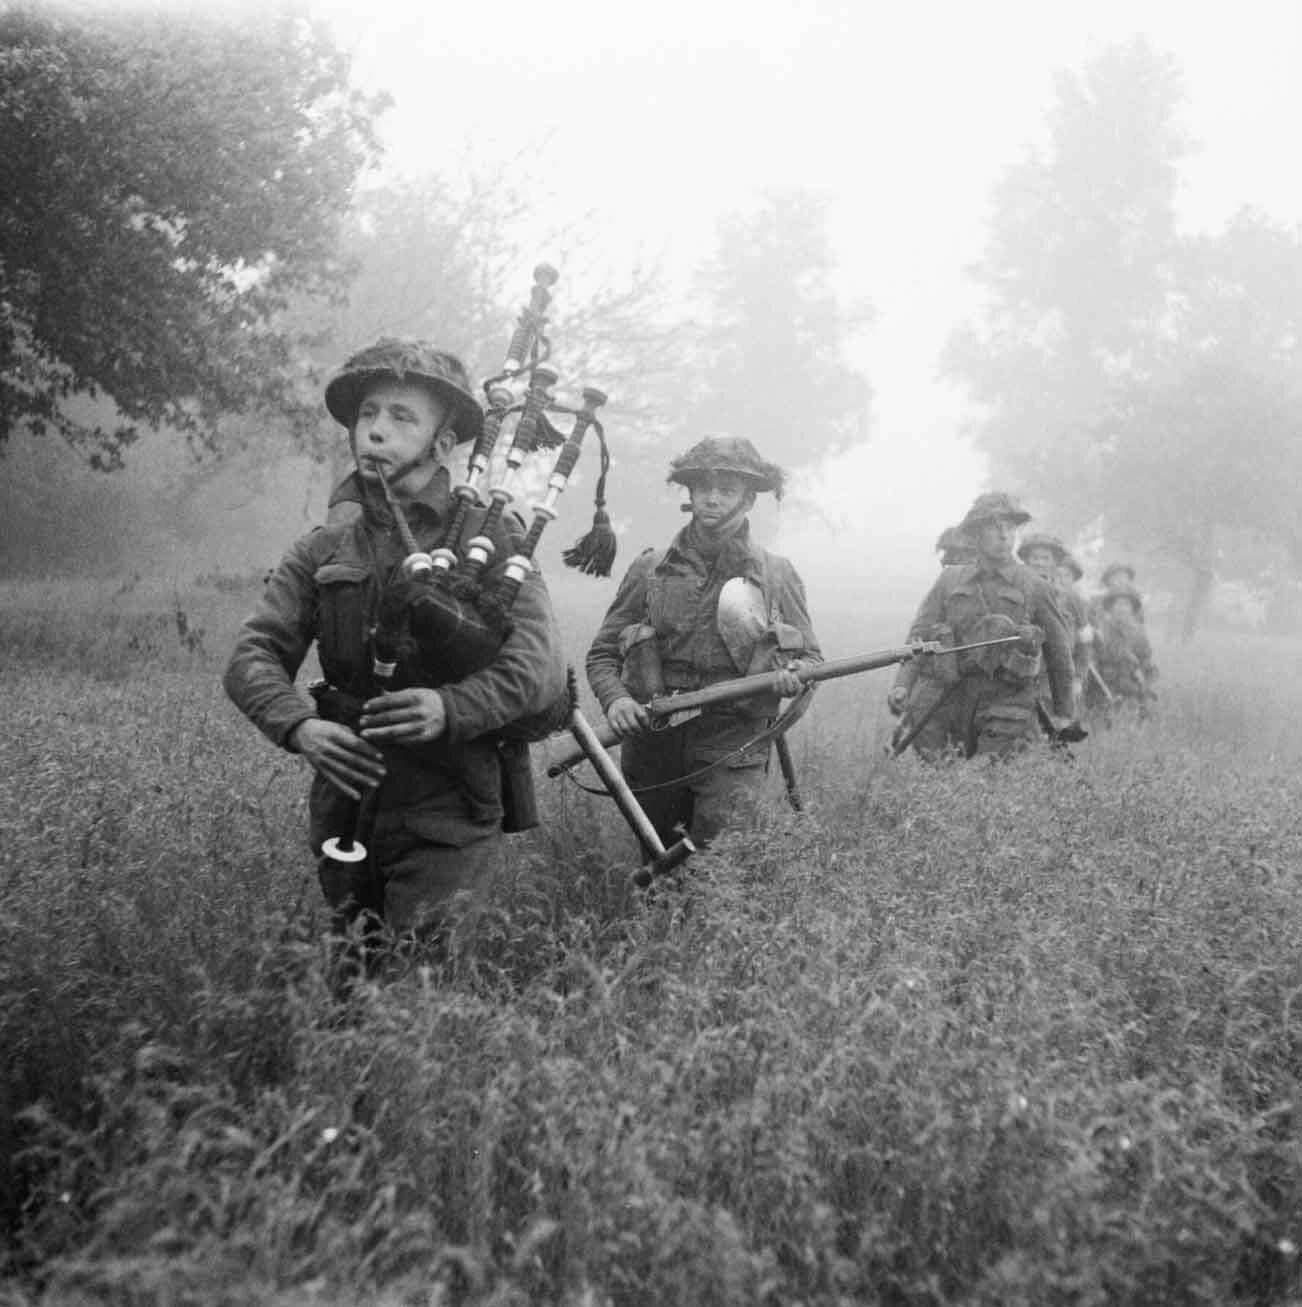 20 November  2020 - 6th Battalion Royal Scot Fusiliers 15th Scottish Division